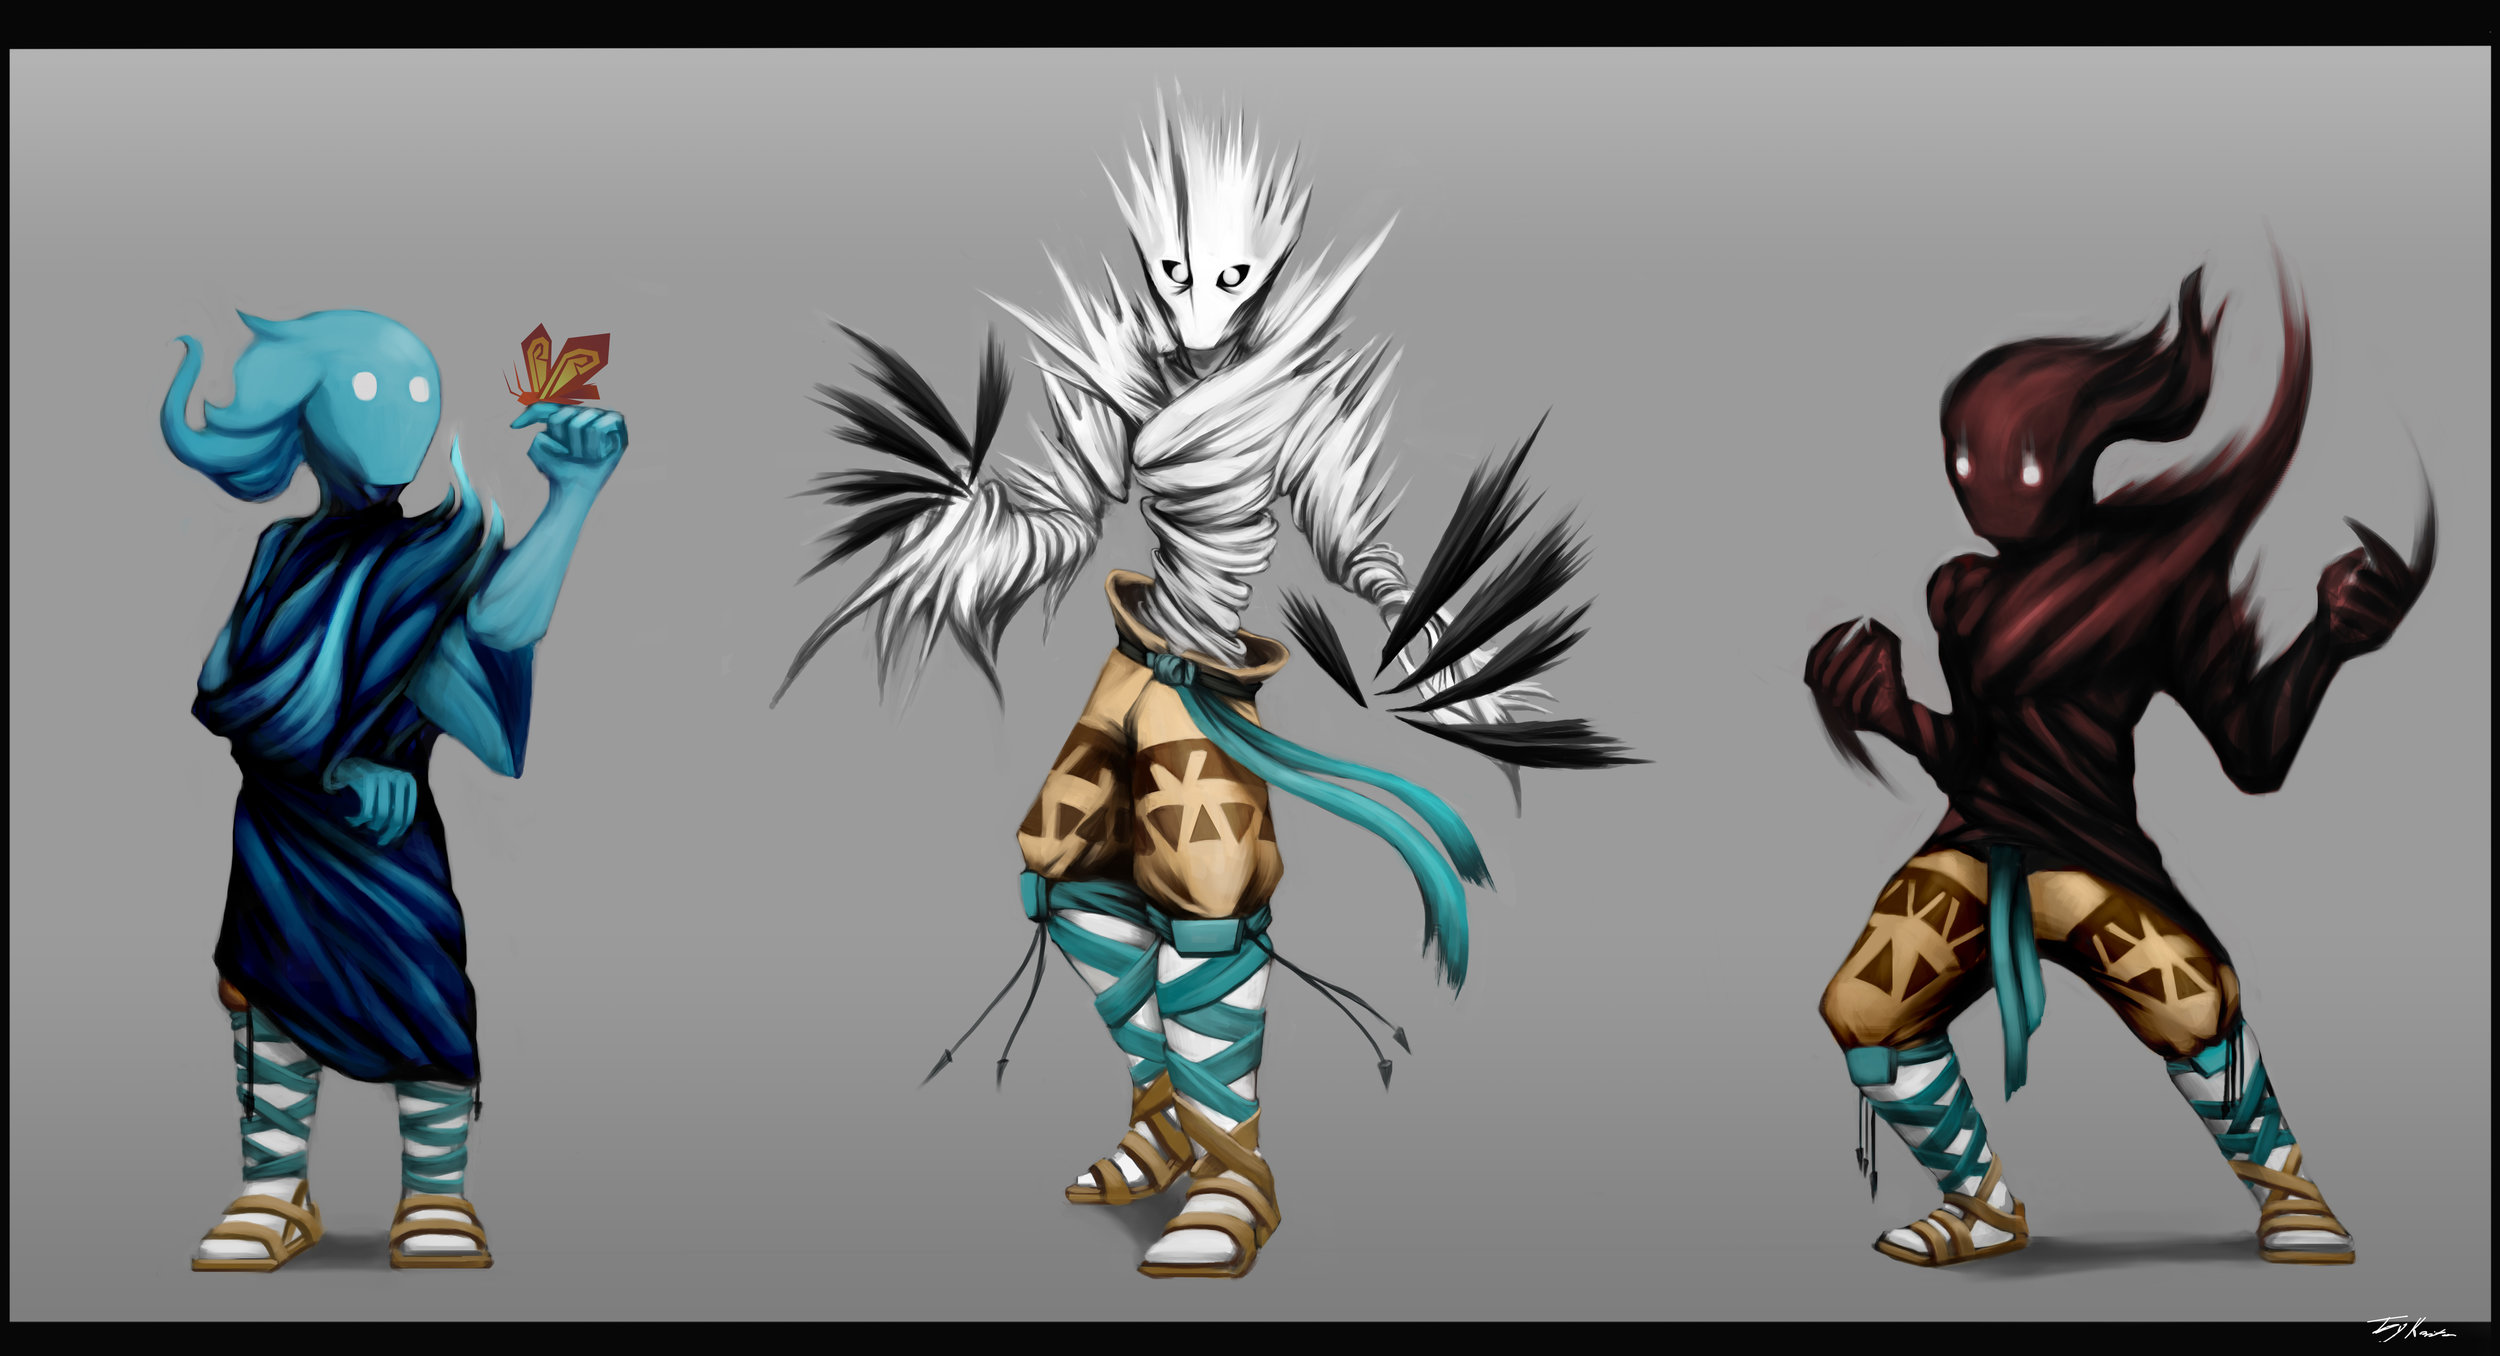 Elemental Siblings (Joey Kozitza)